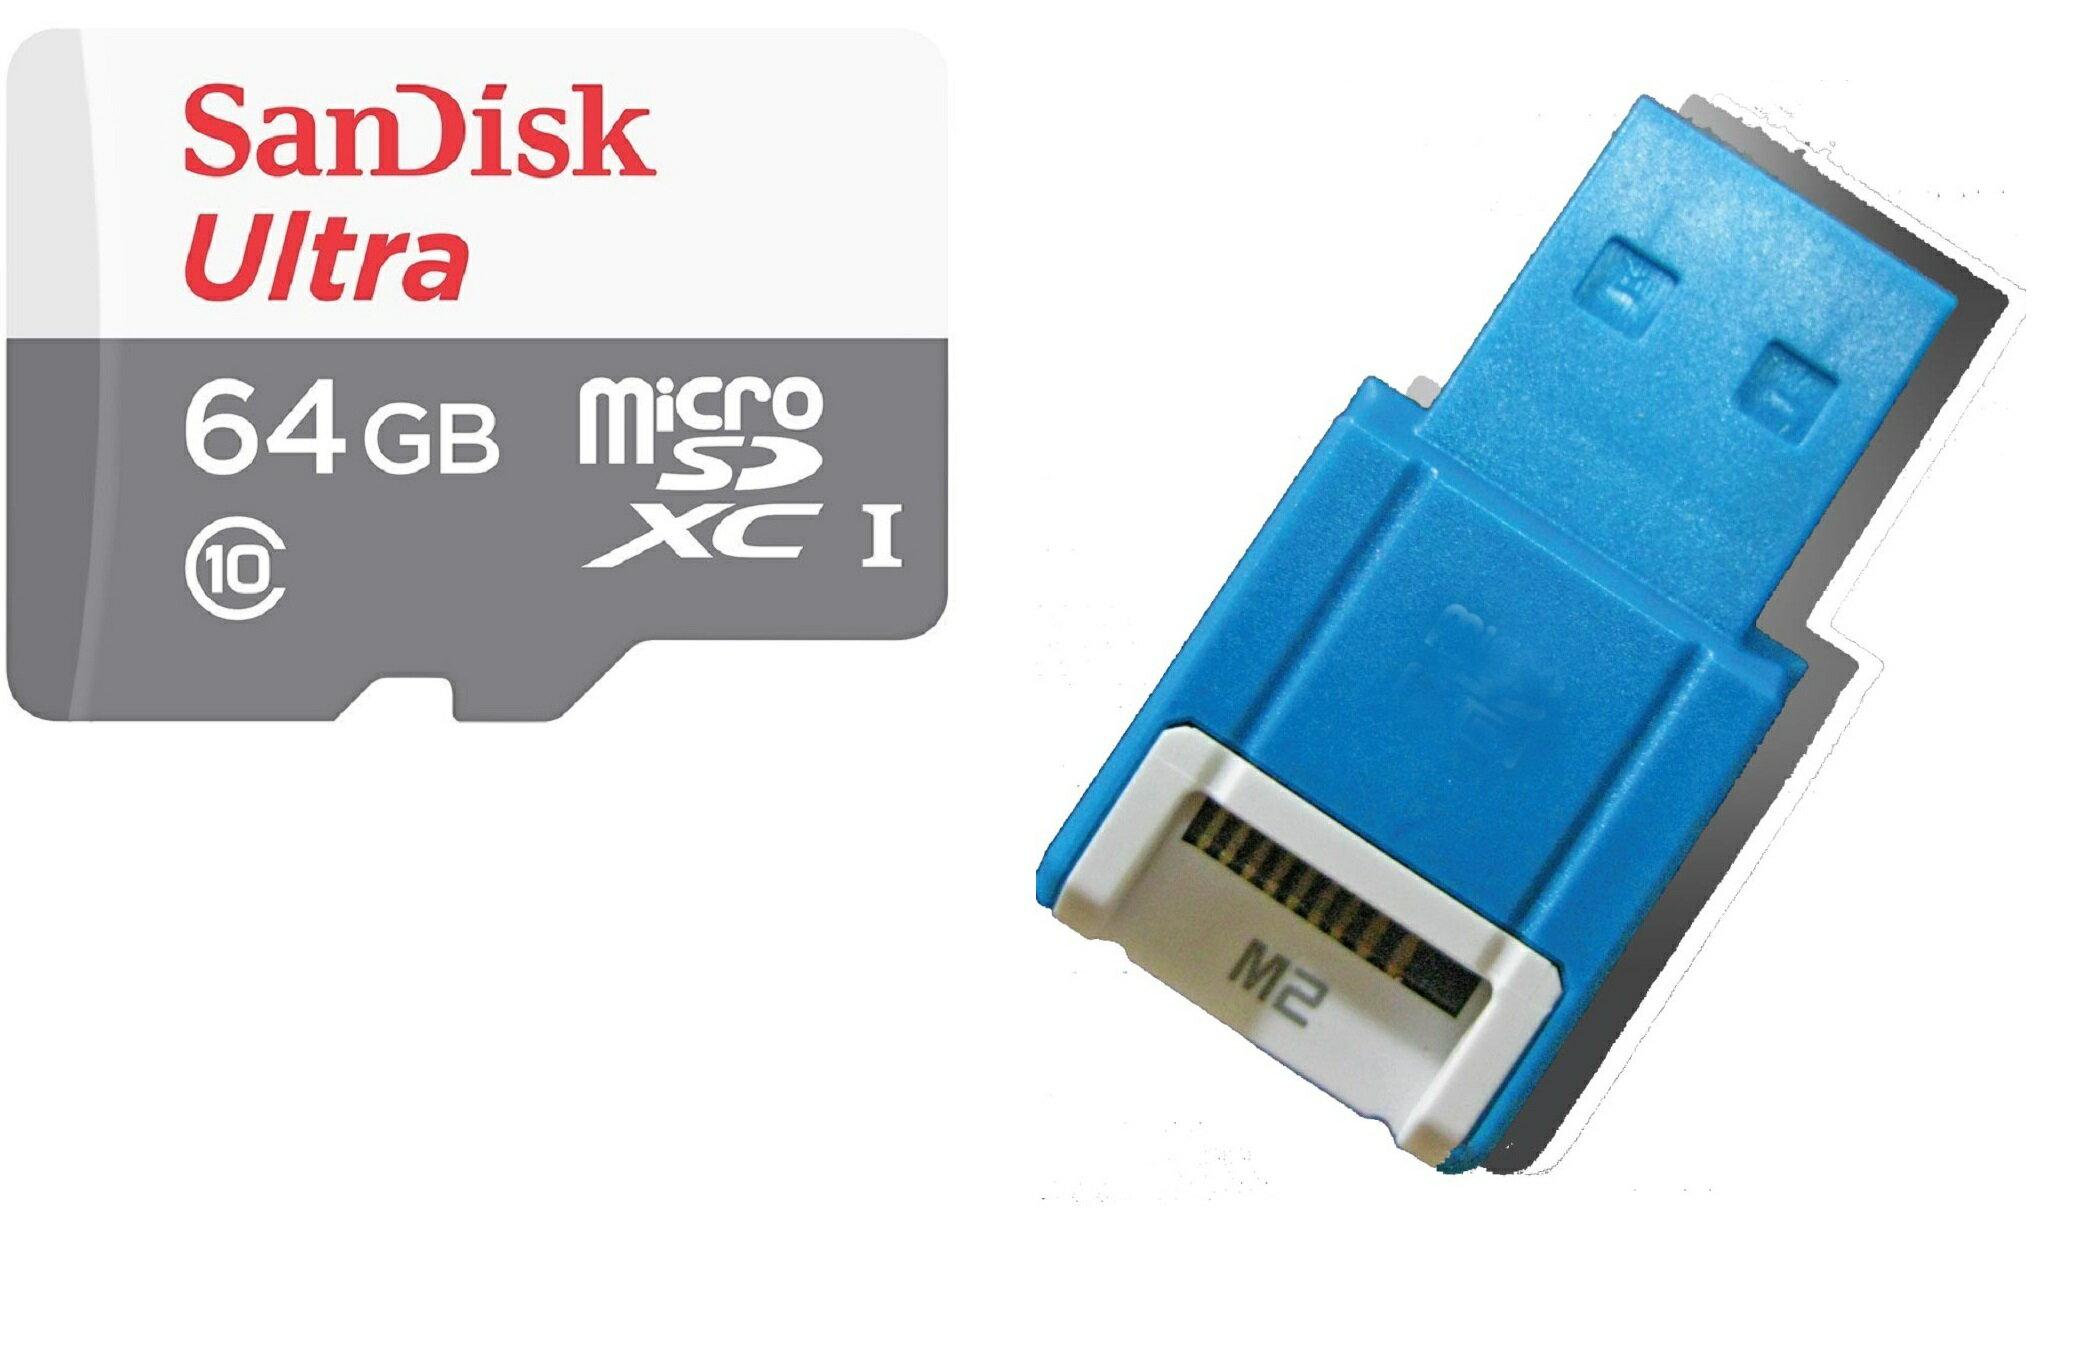 SanDisk Ultra 64GB 80MB/s microSDXC 64G microSD micro SD SDXC UHS-I C10 Class 10 Flash Memory Card SDSQUNS-064G + OEM USB 2.0 Card Reader 0